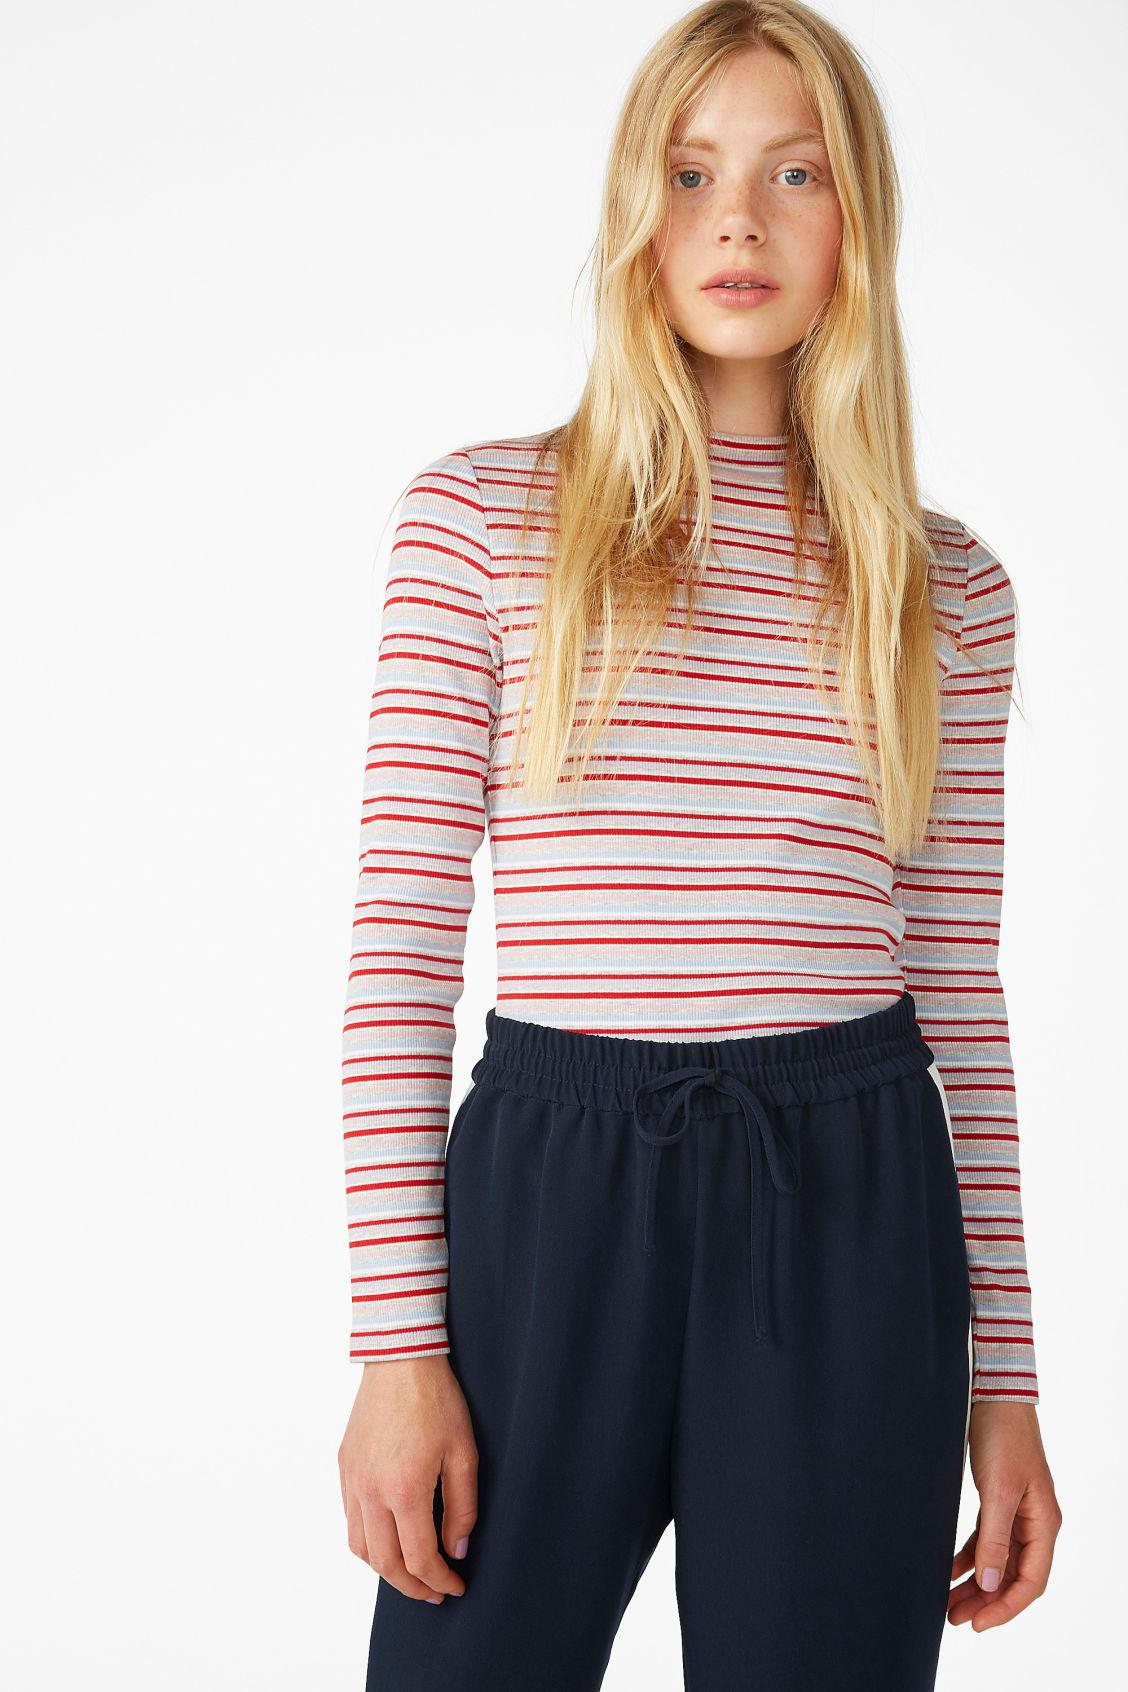 3c83ab55348c95 Long-sleeved low turtleneck top - Stripes - Tops - Monki